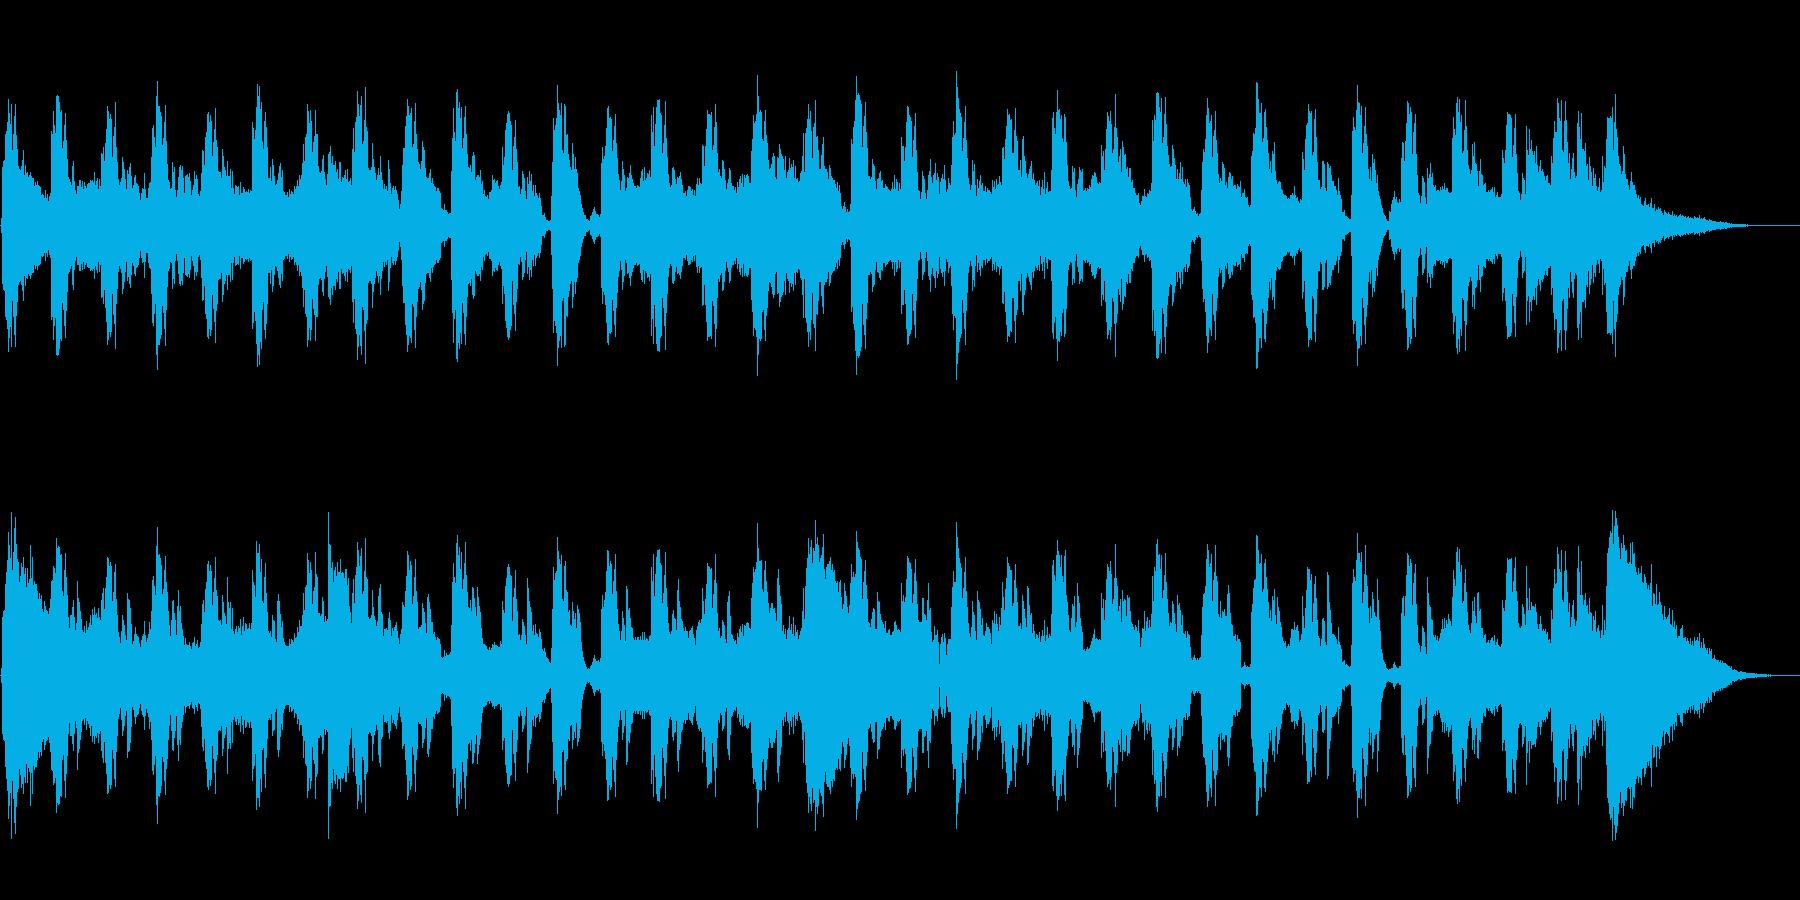 acidなジングルの再生済みの波形